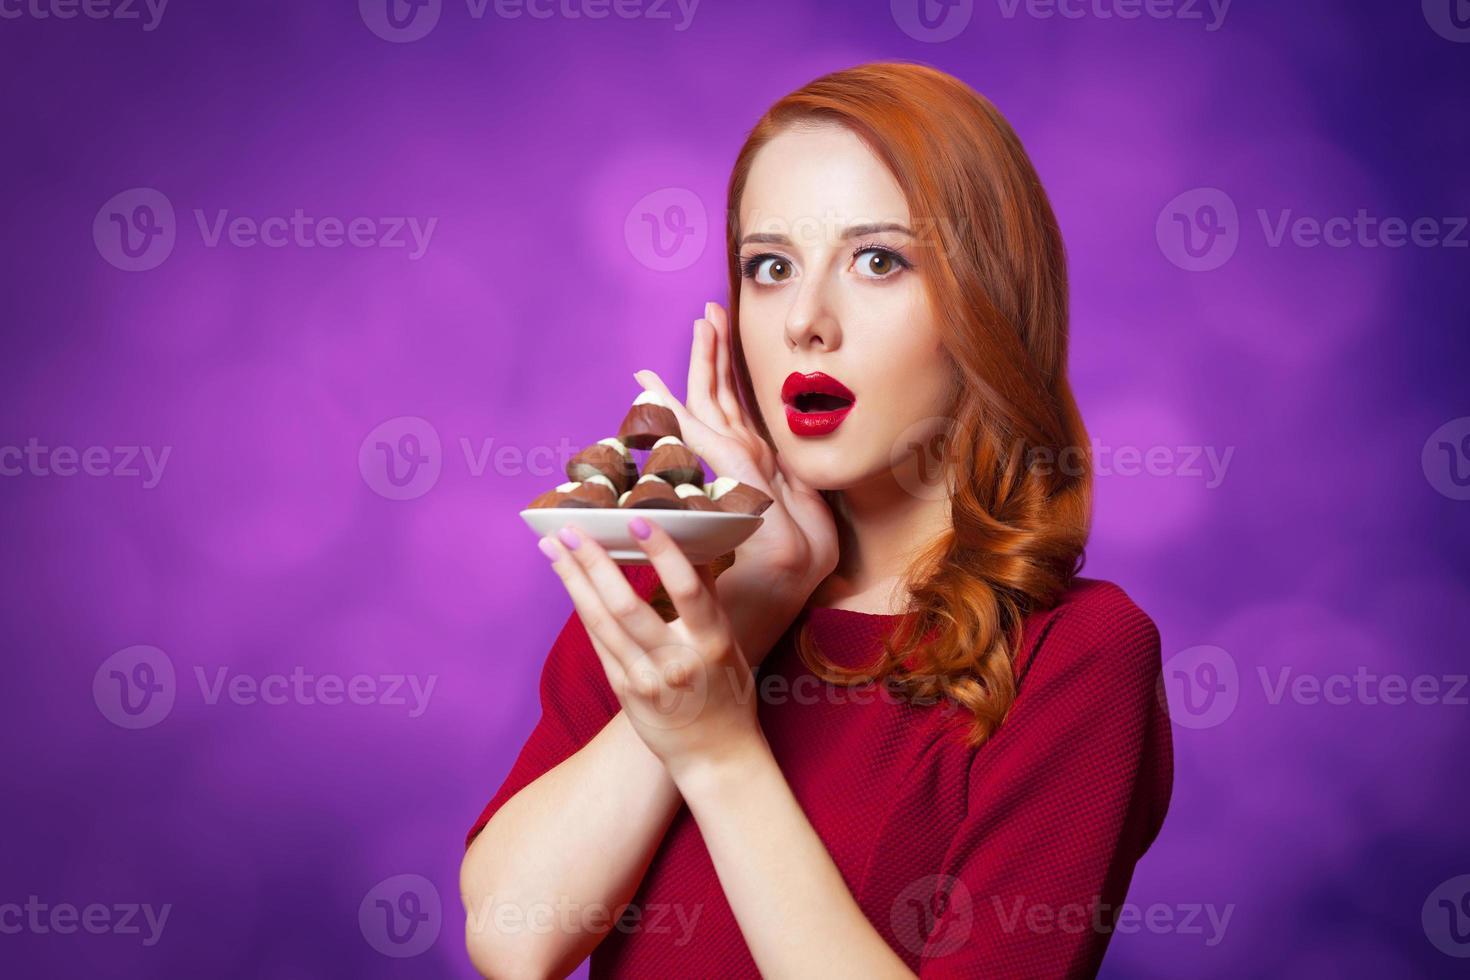 mujeres pelirrojas con dulces sobre fondo violeta. foto